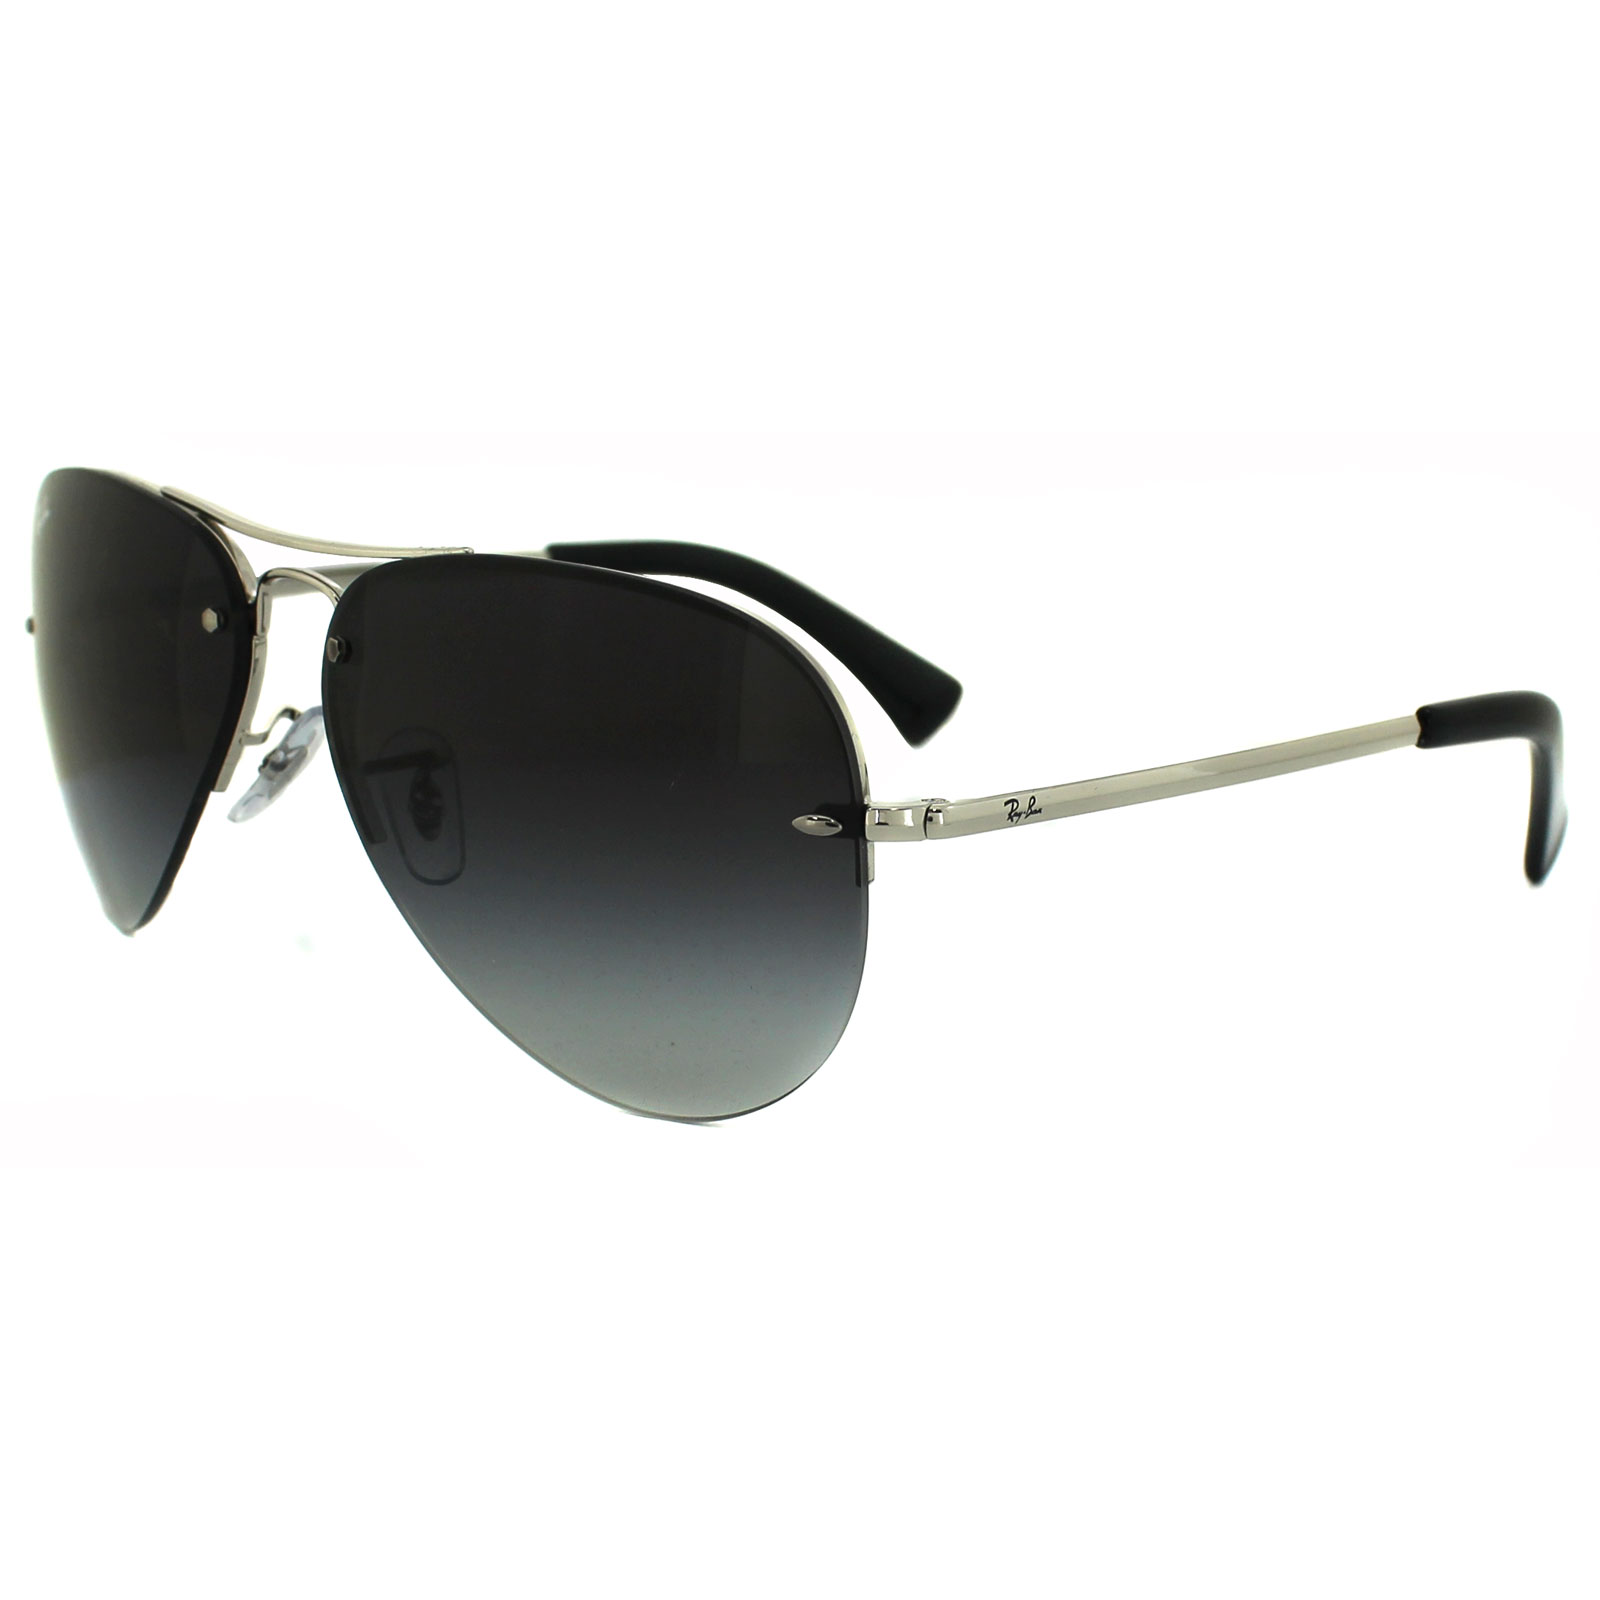 76e1a54279 Cheap Ray-Ban 3449 Sunglasses - Discounted Sunglasses